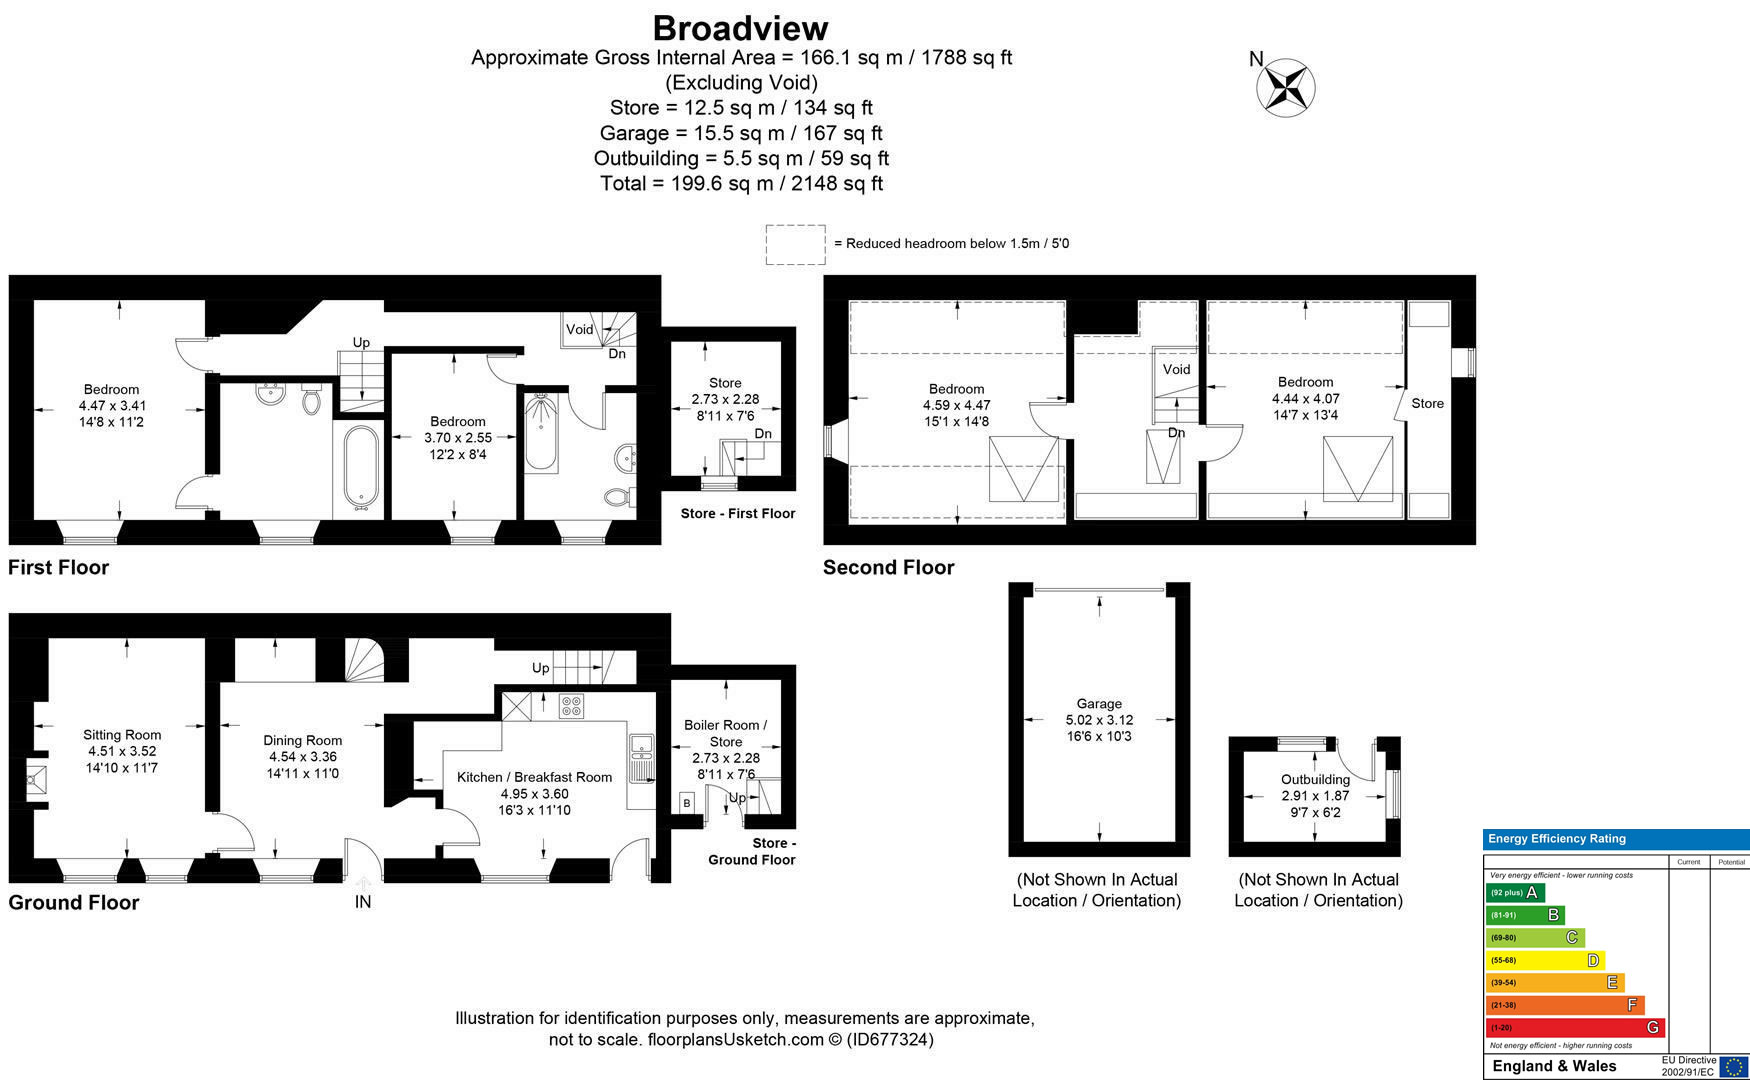 Broadview - New brochure